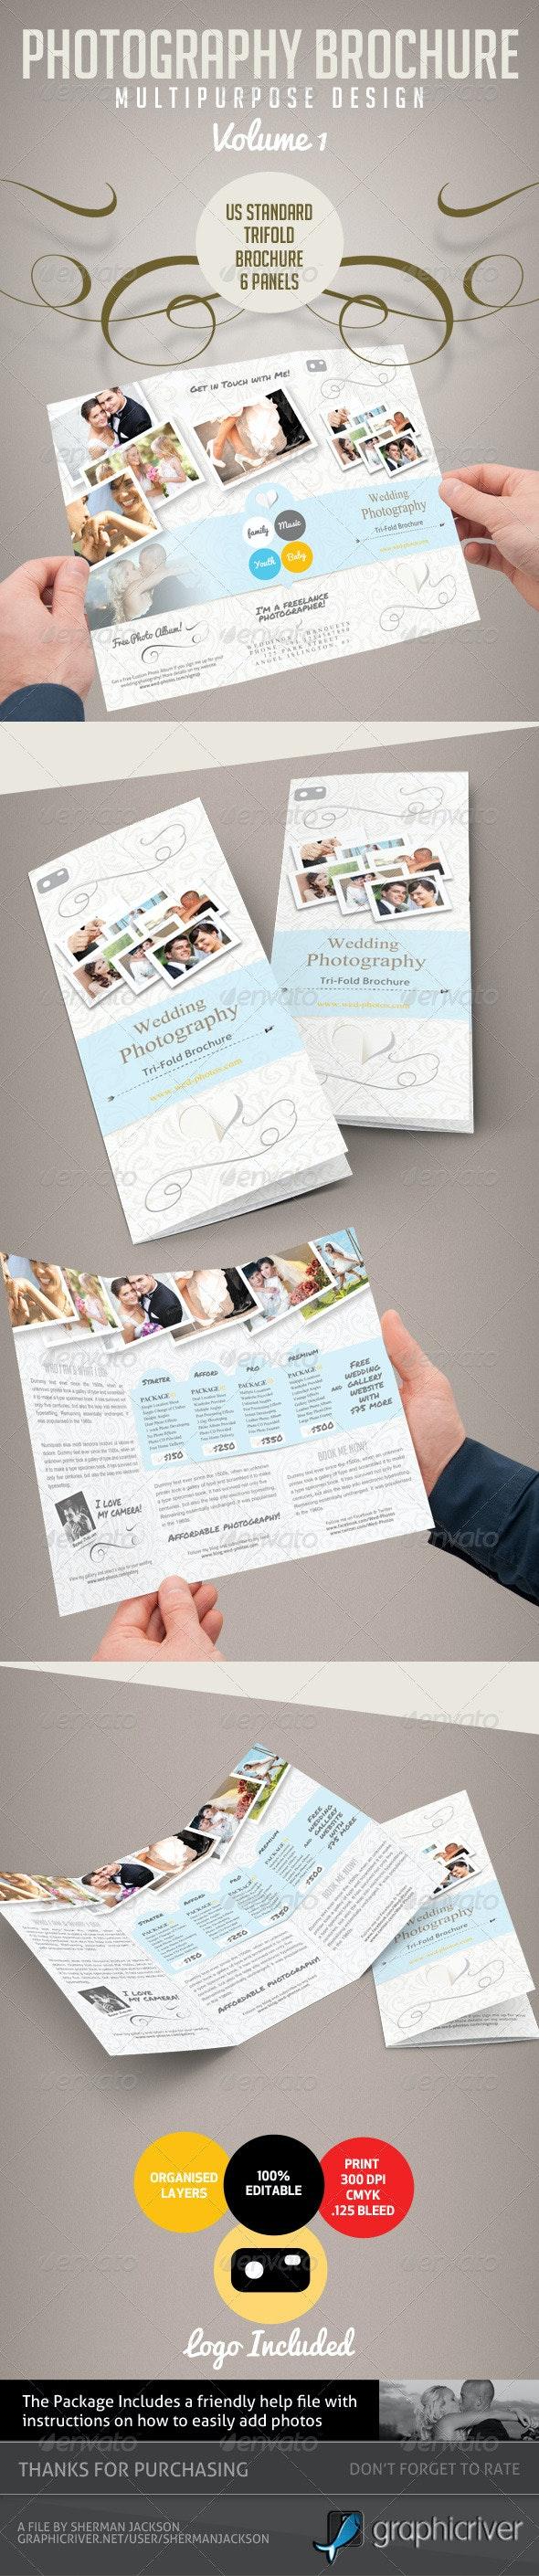 Pro Photography Trifold Brochure - Volume 1 - Brochures Print Templates